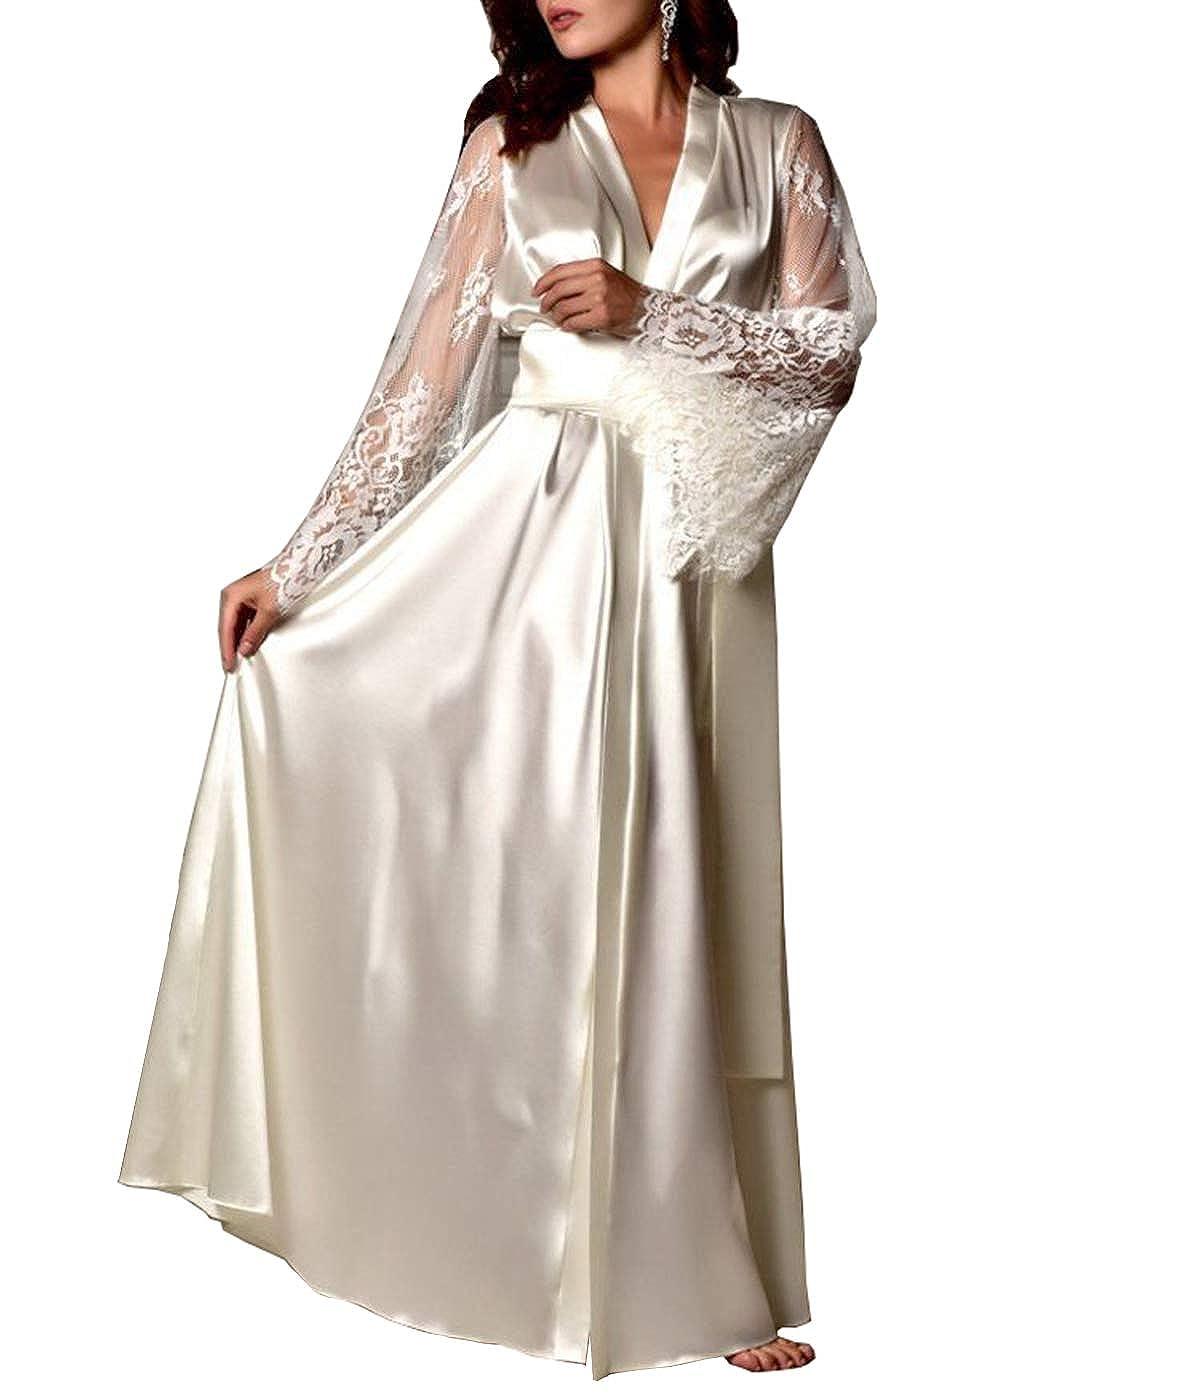 air-SMART Womens Lace Trim Kimonos Robes Long Satin Dressing Gown Bathrobe Sleepwear